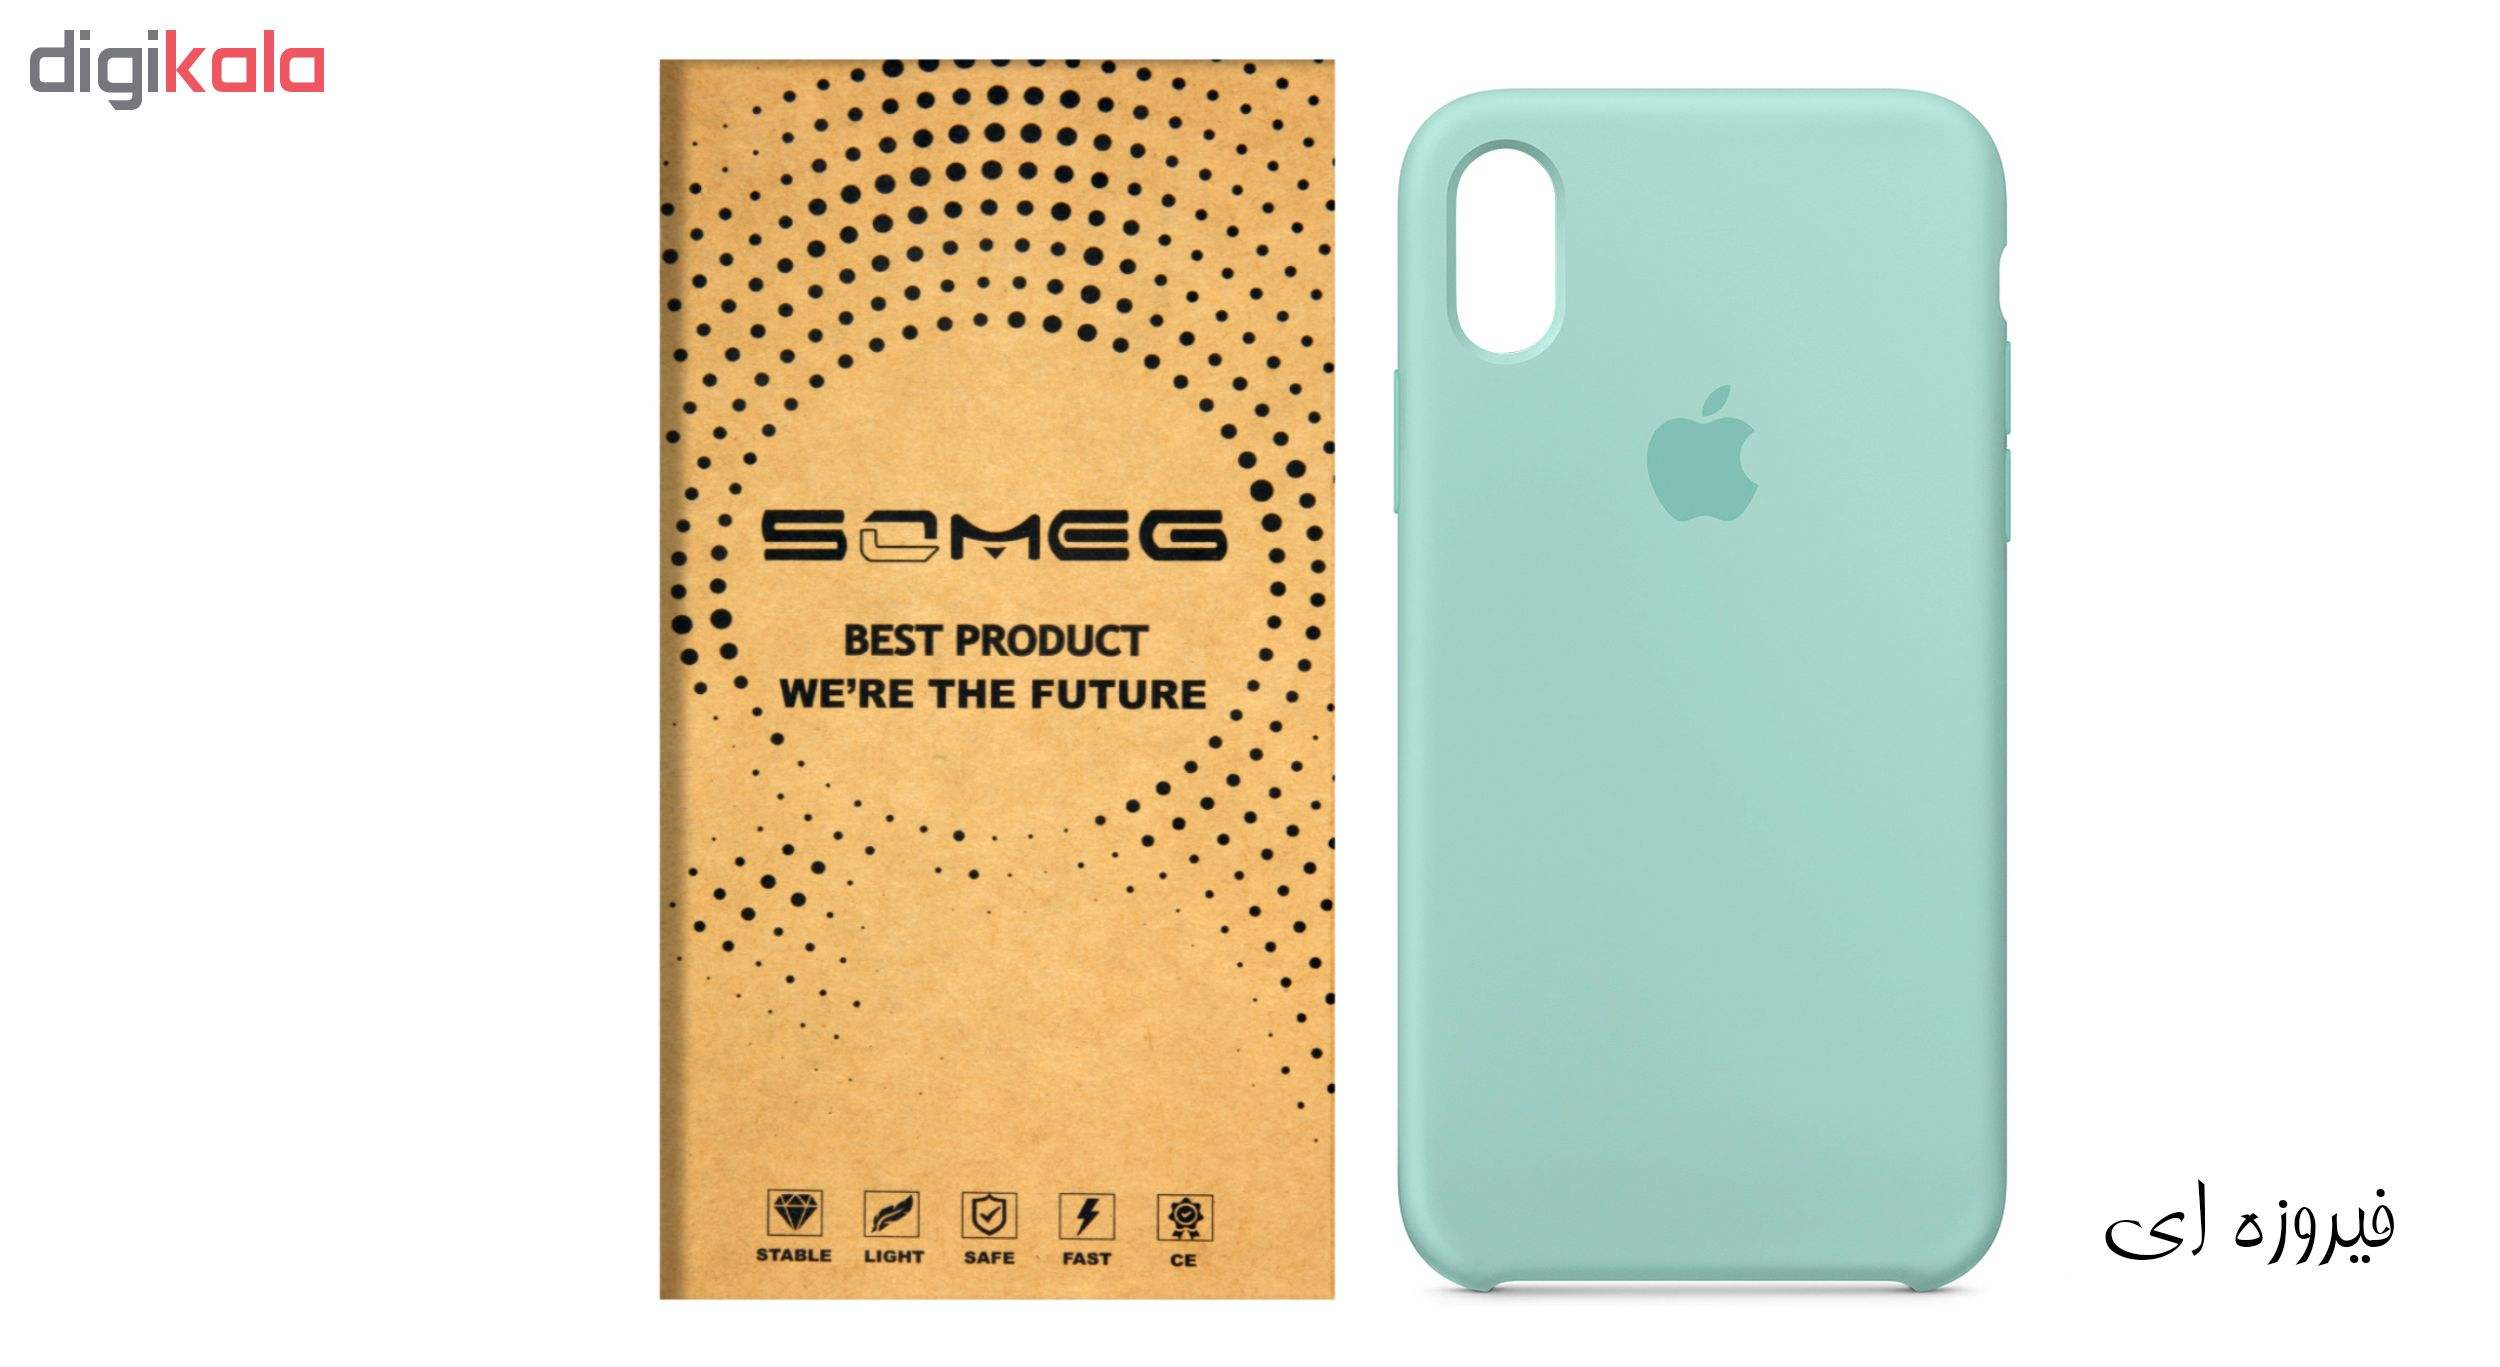 کاور سومگ مدل SIC مناسب برای گوشی موبایل اپل iPhone X  main 1 9